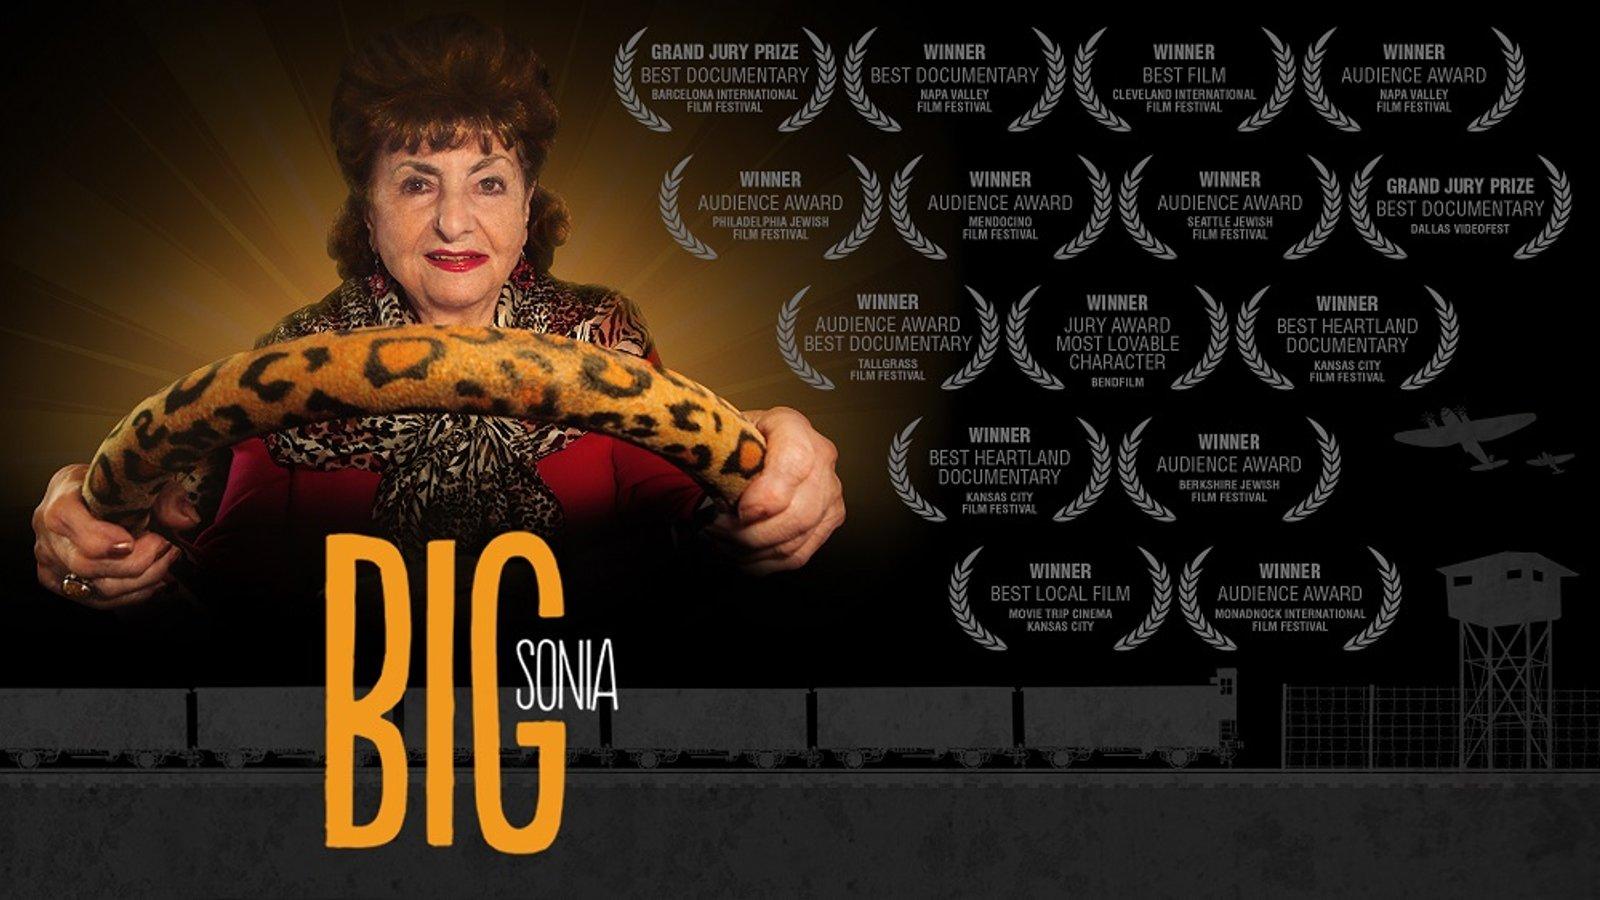 Big Sonia - A Holocaust Survivor Faces a Difficult Decision